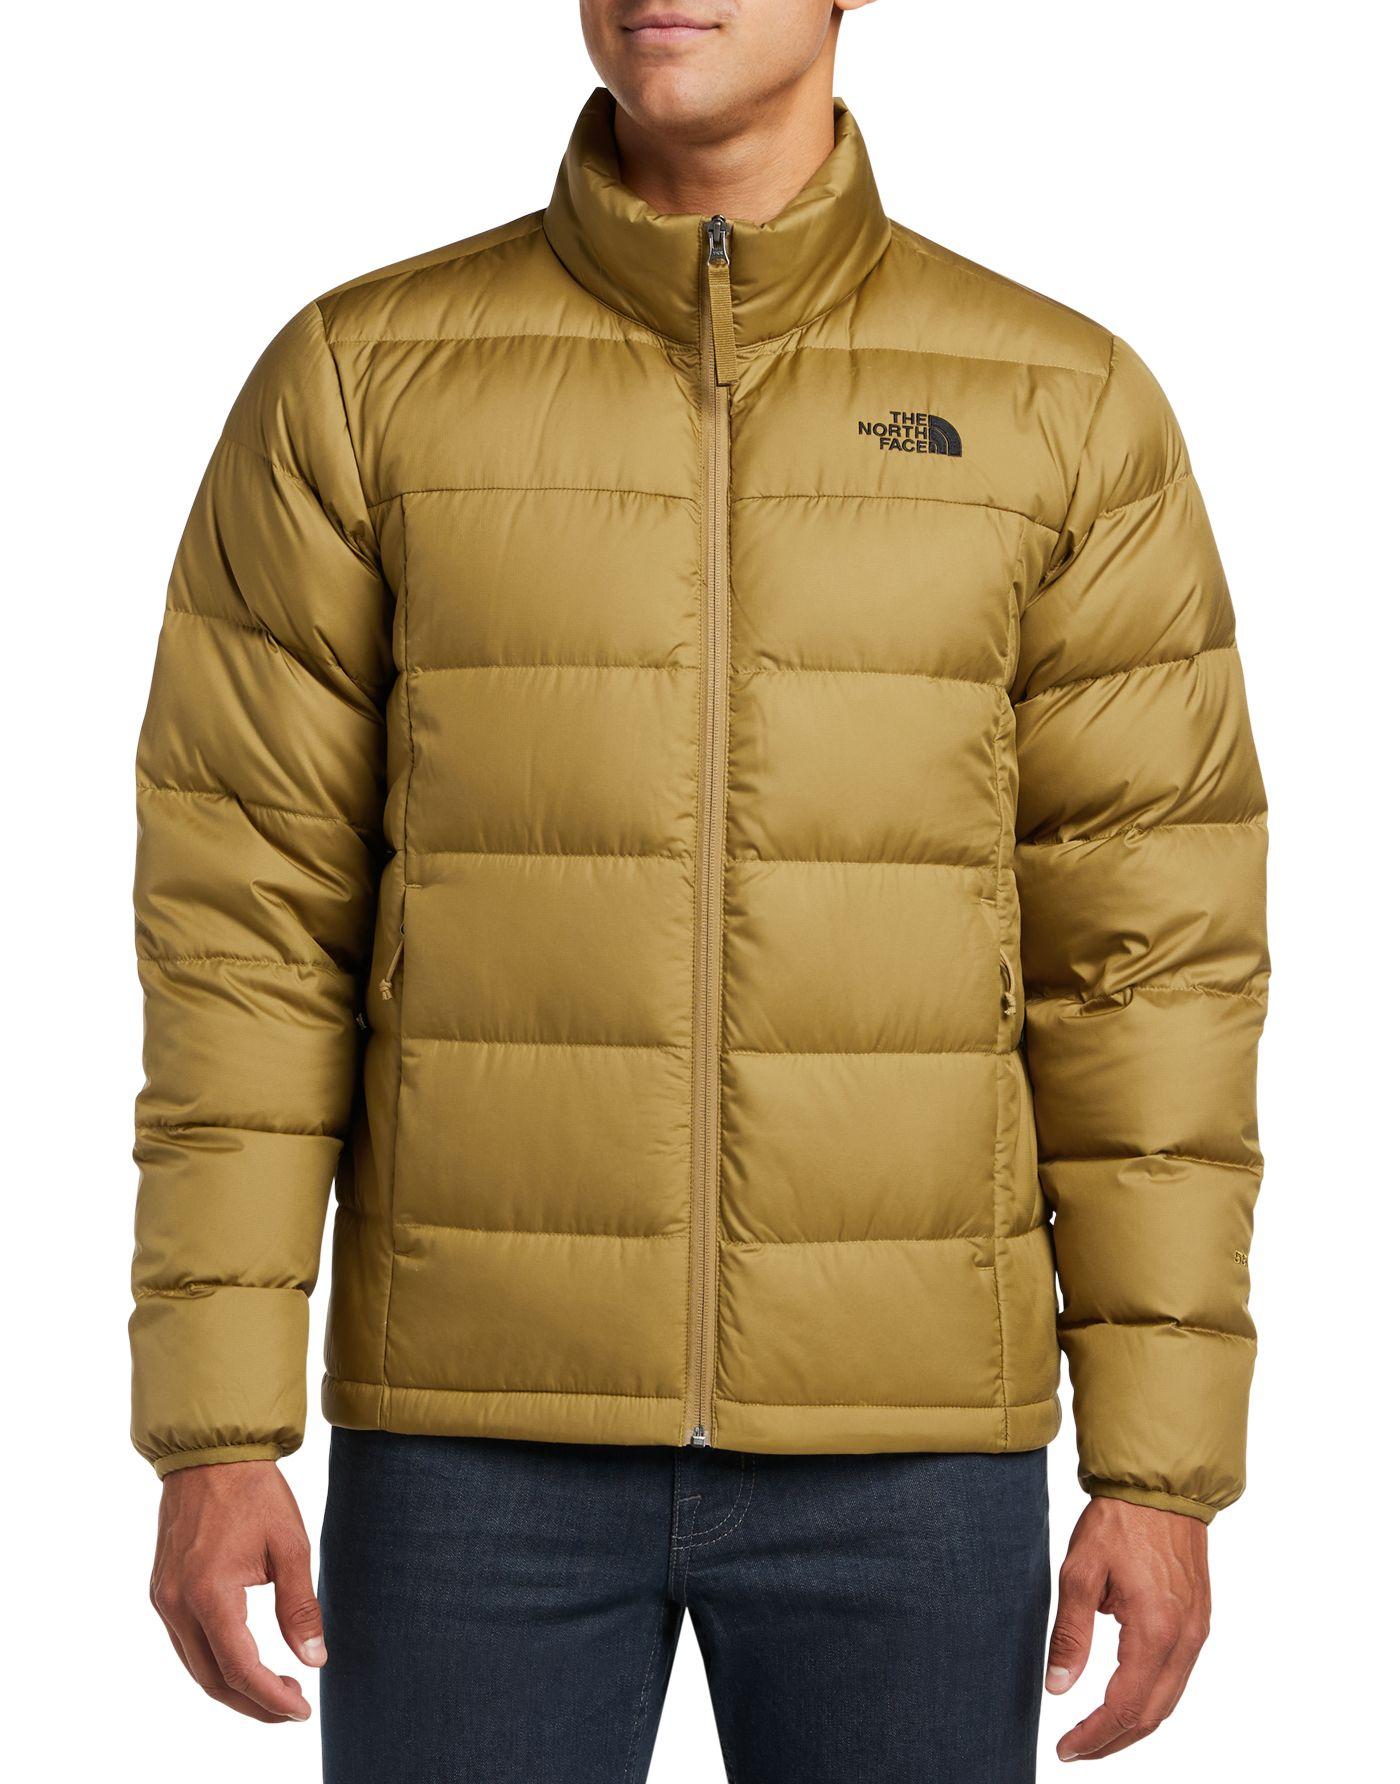 The North Face Men's Alpz 2.0 Down Jacket